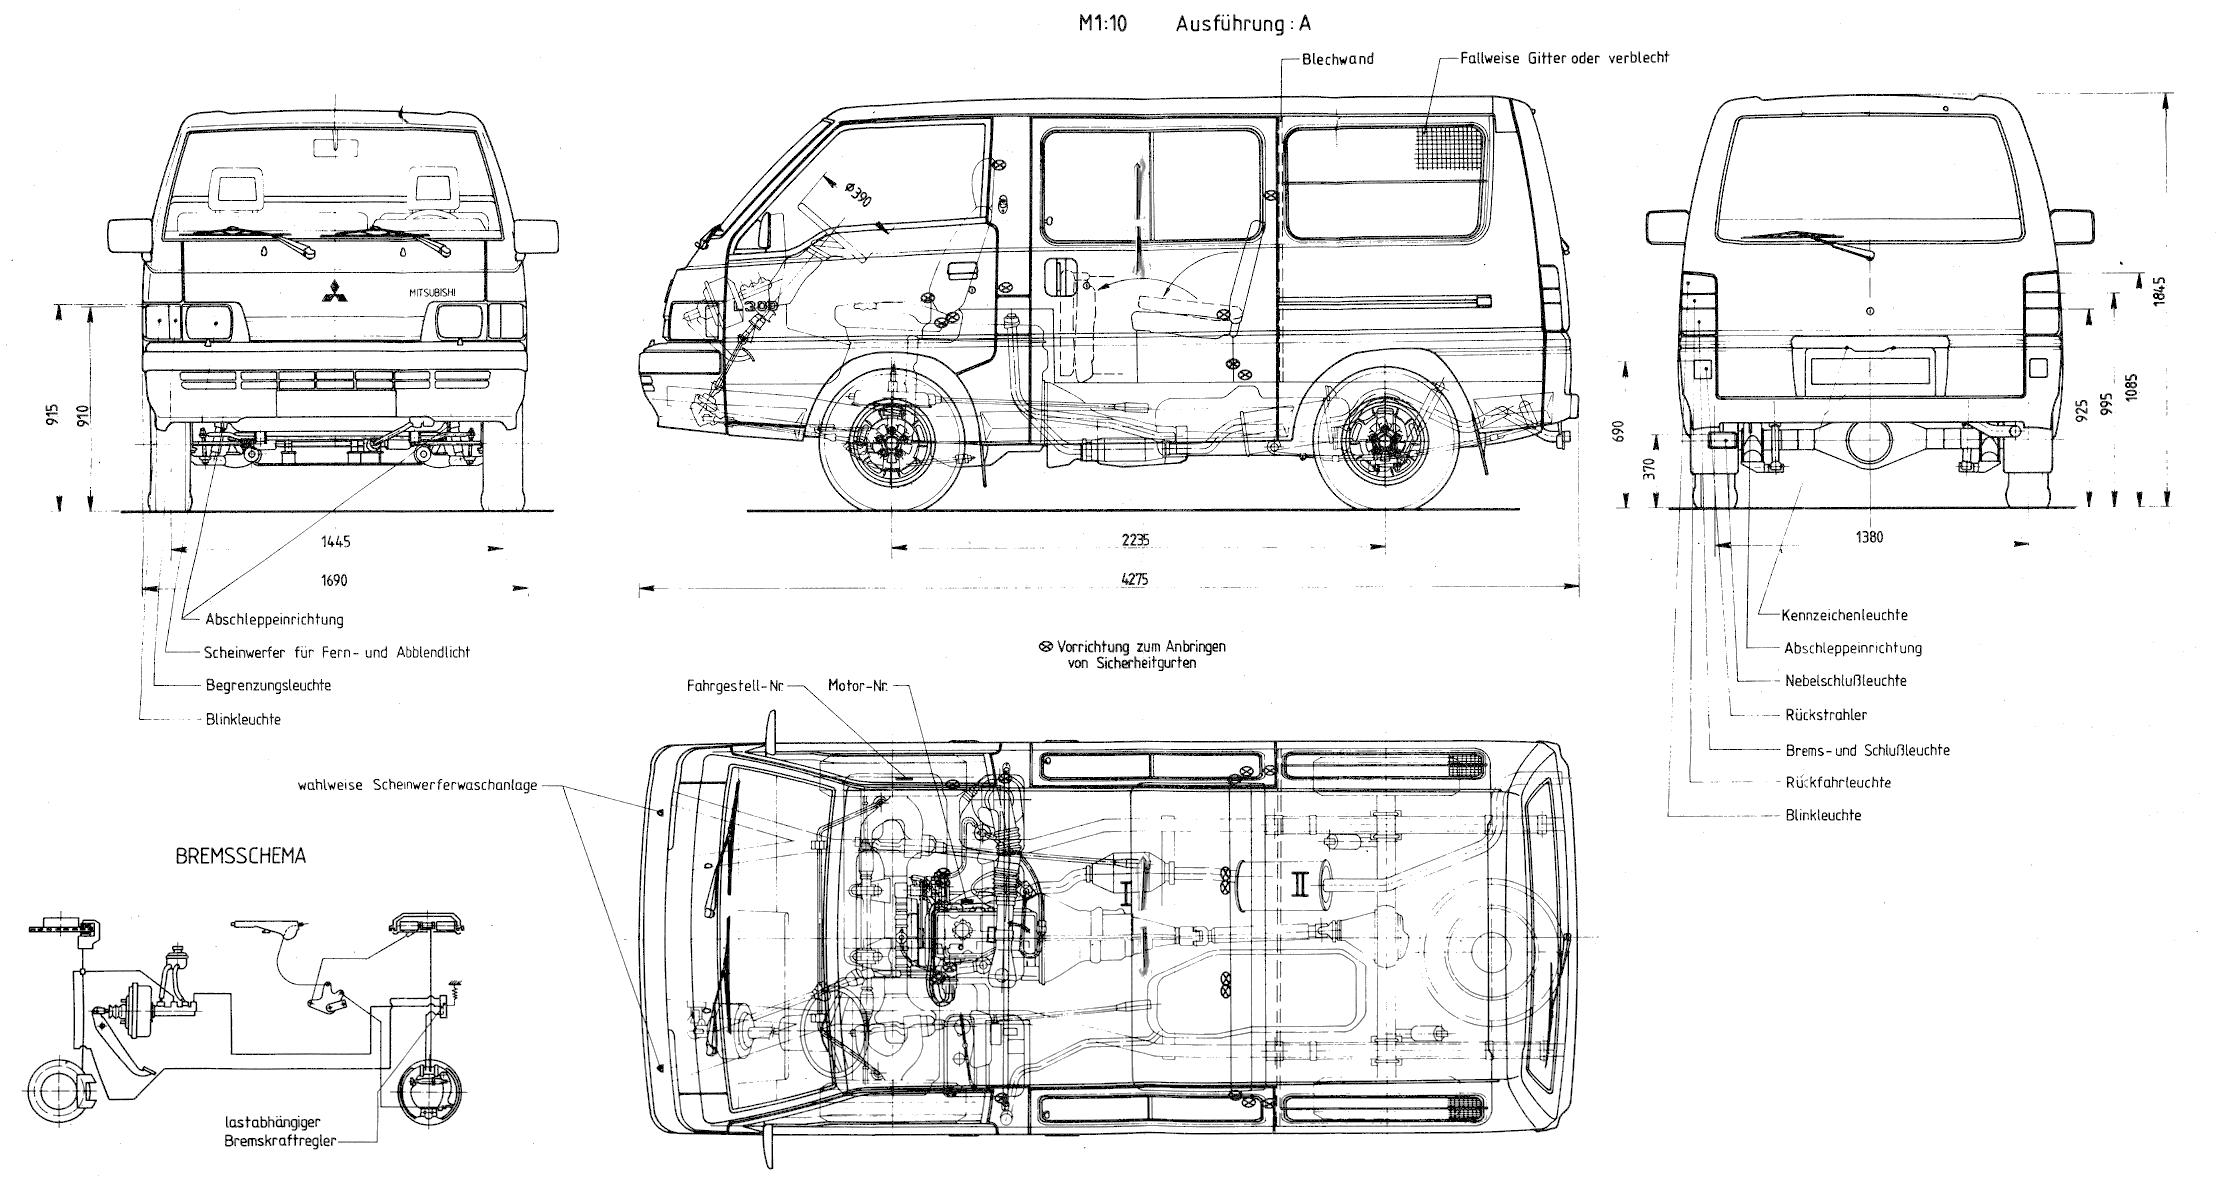 Mitsubishi L300 blueprint